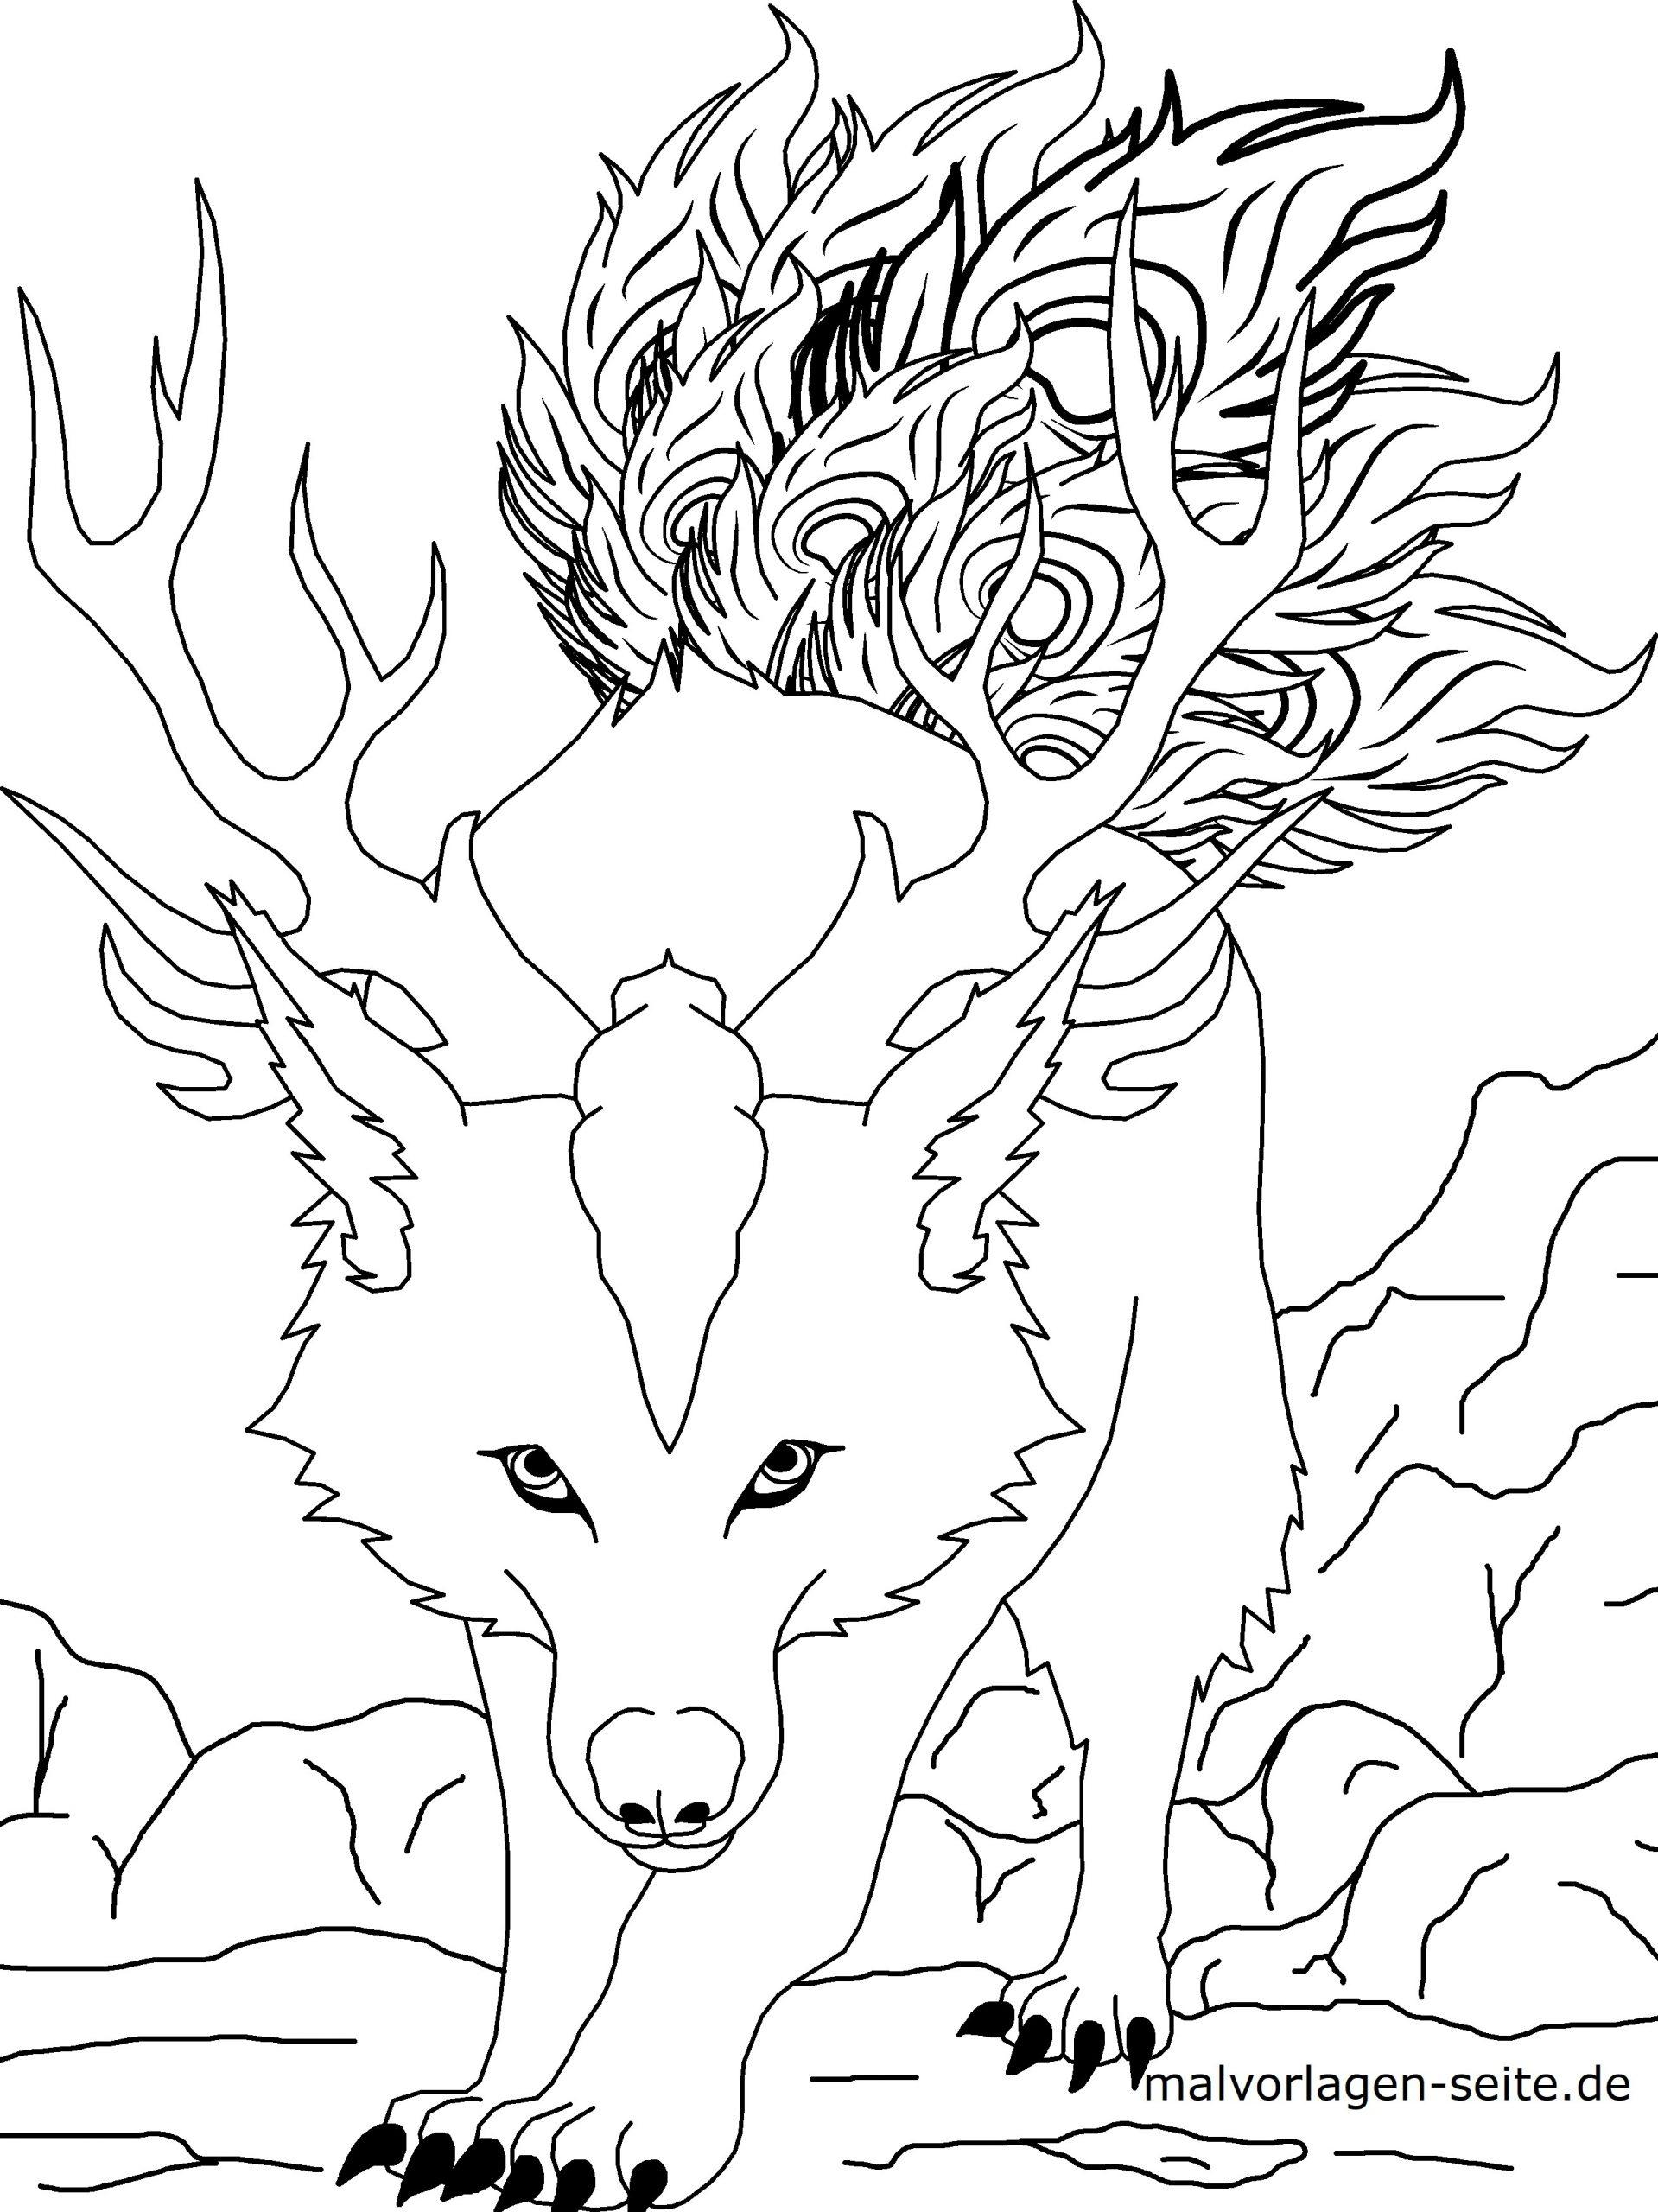 Malvorlage Manga Comic Figur - Ausmalbilder Kostenlos für Ausmalbilder Wölfe Kostenlos